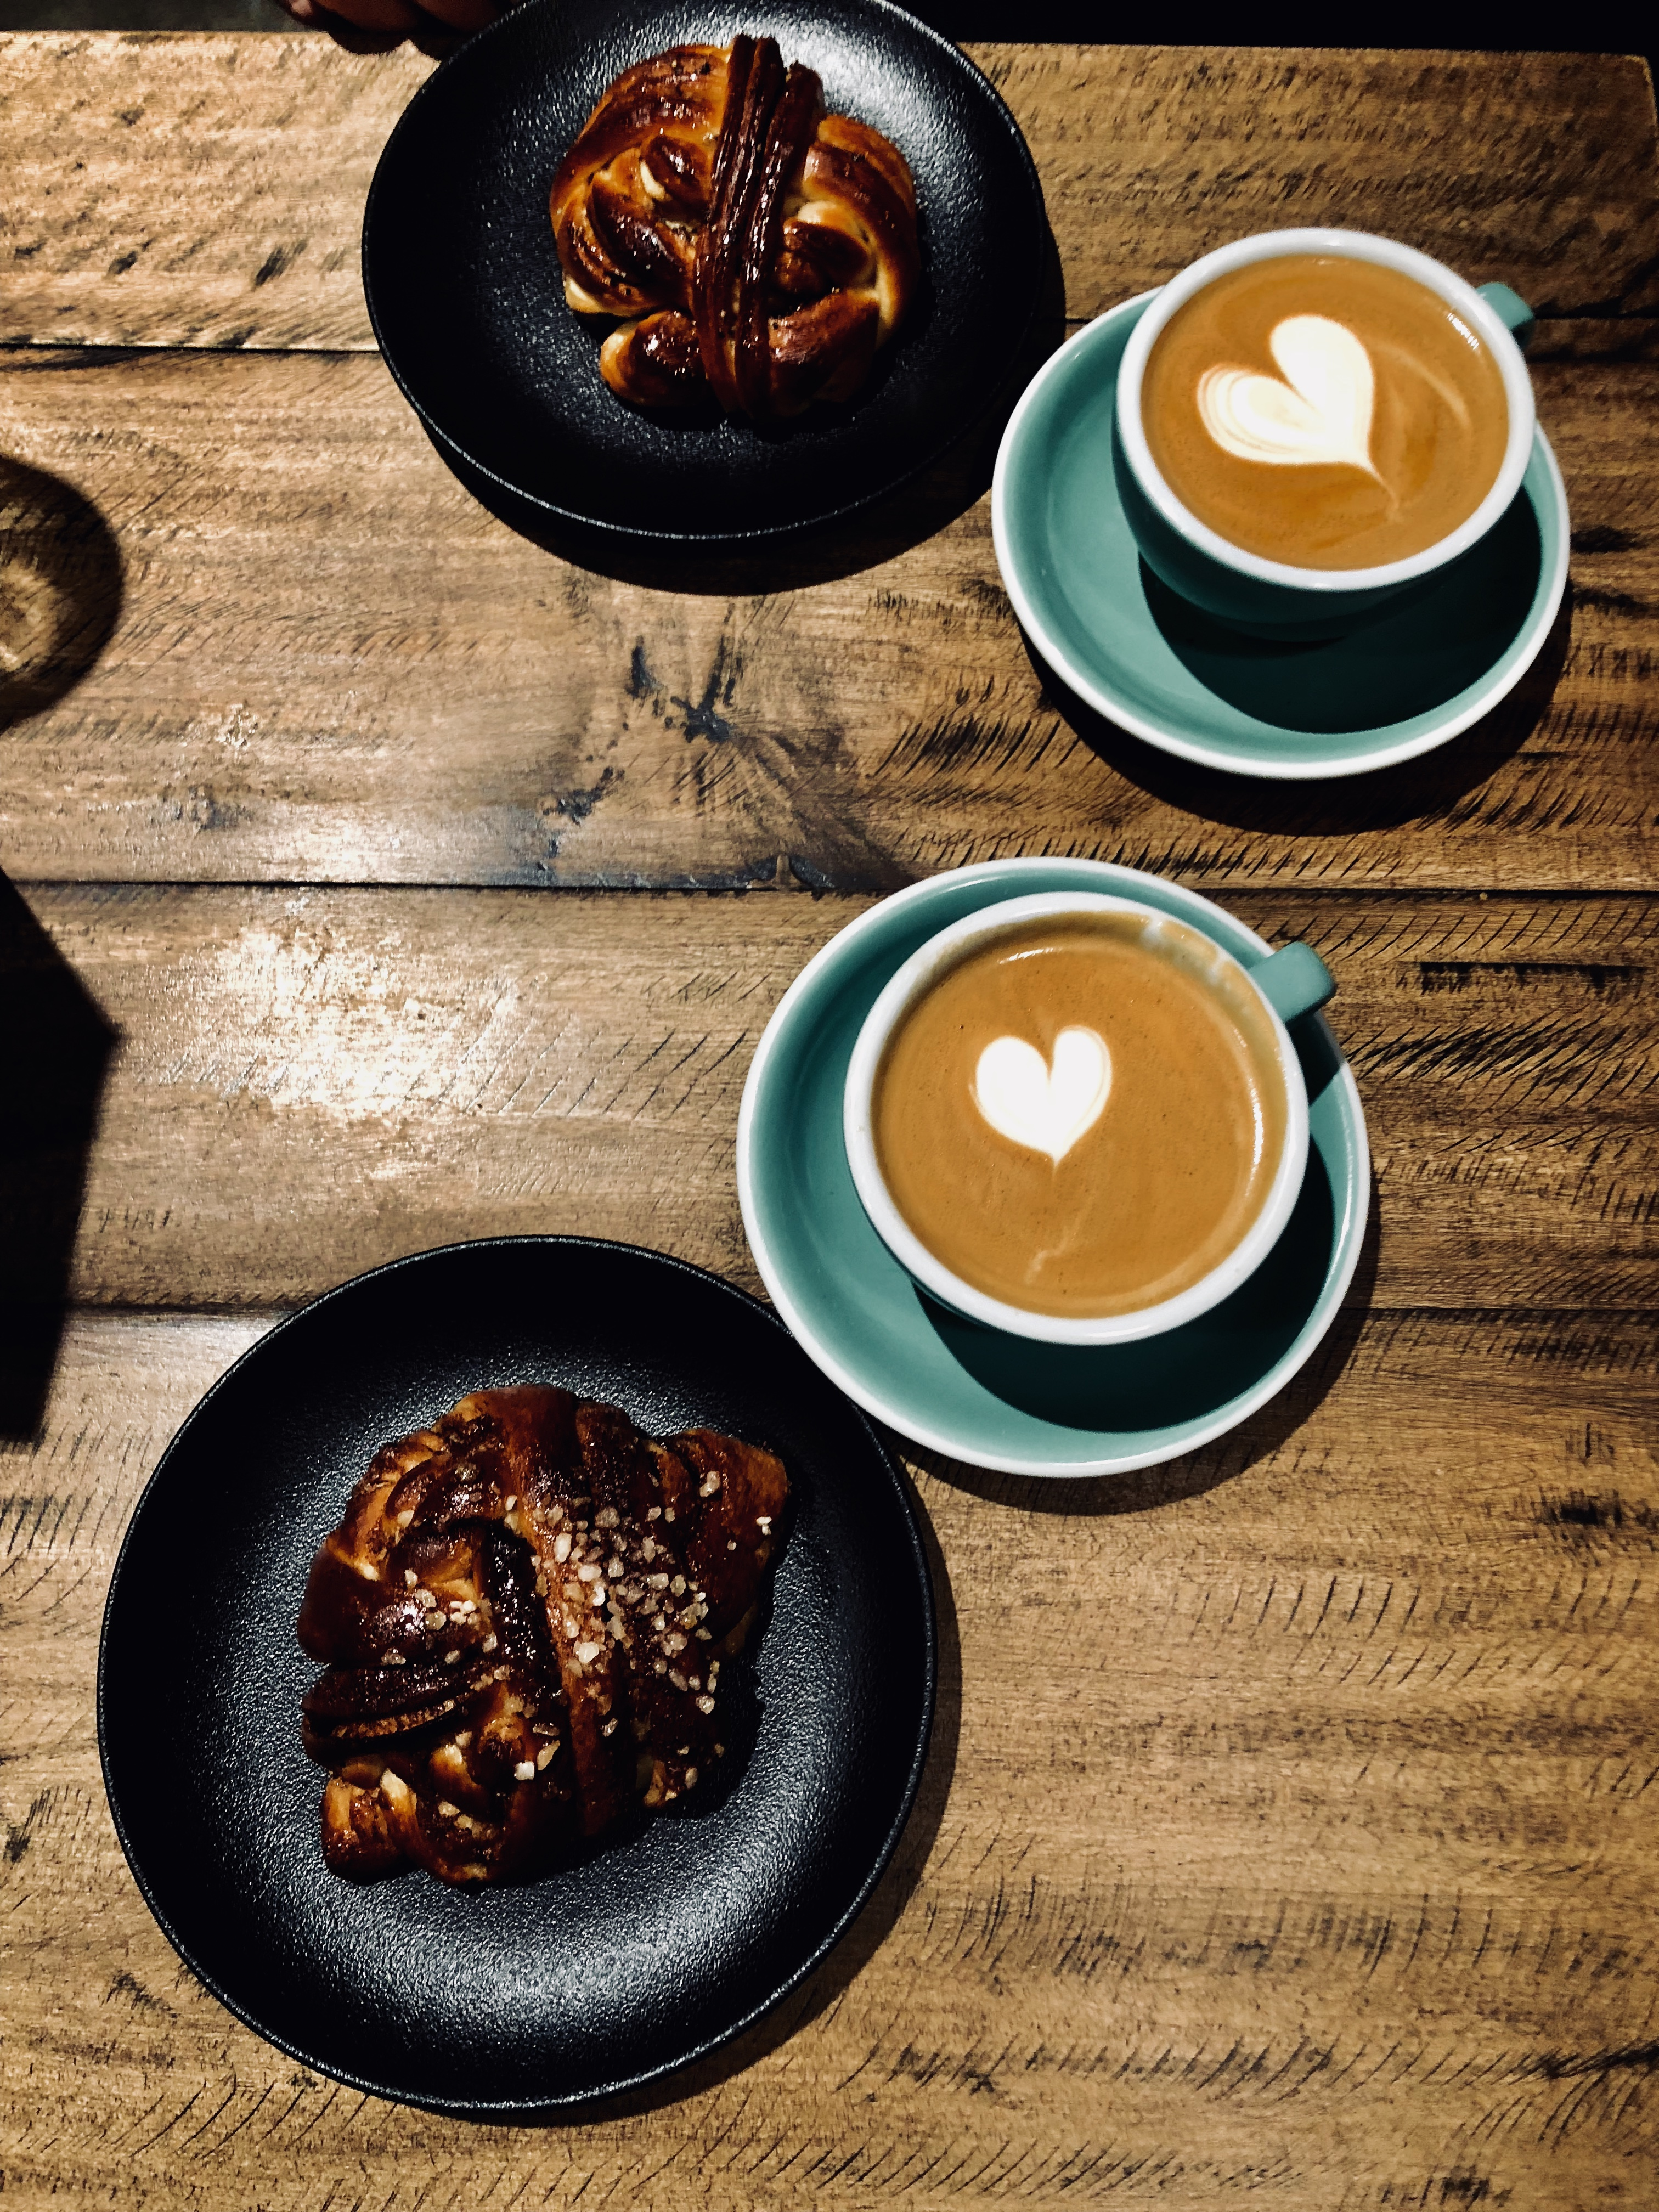 Travel Diary 48 Stunden in Tallinn Rost Cafe